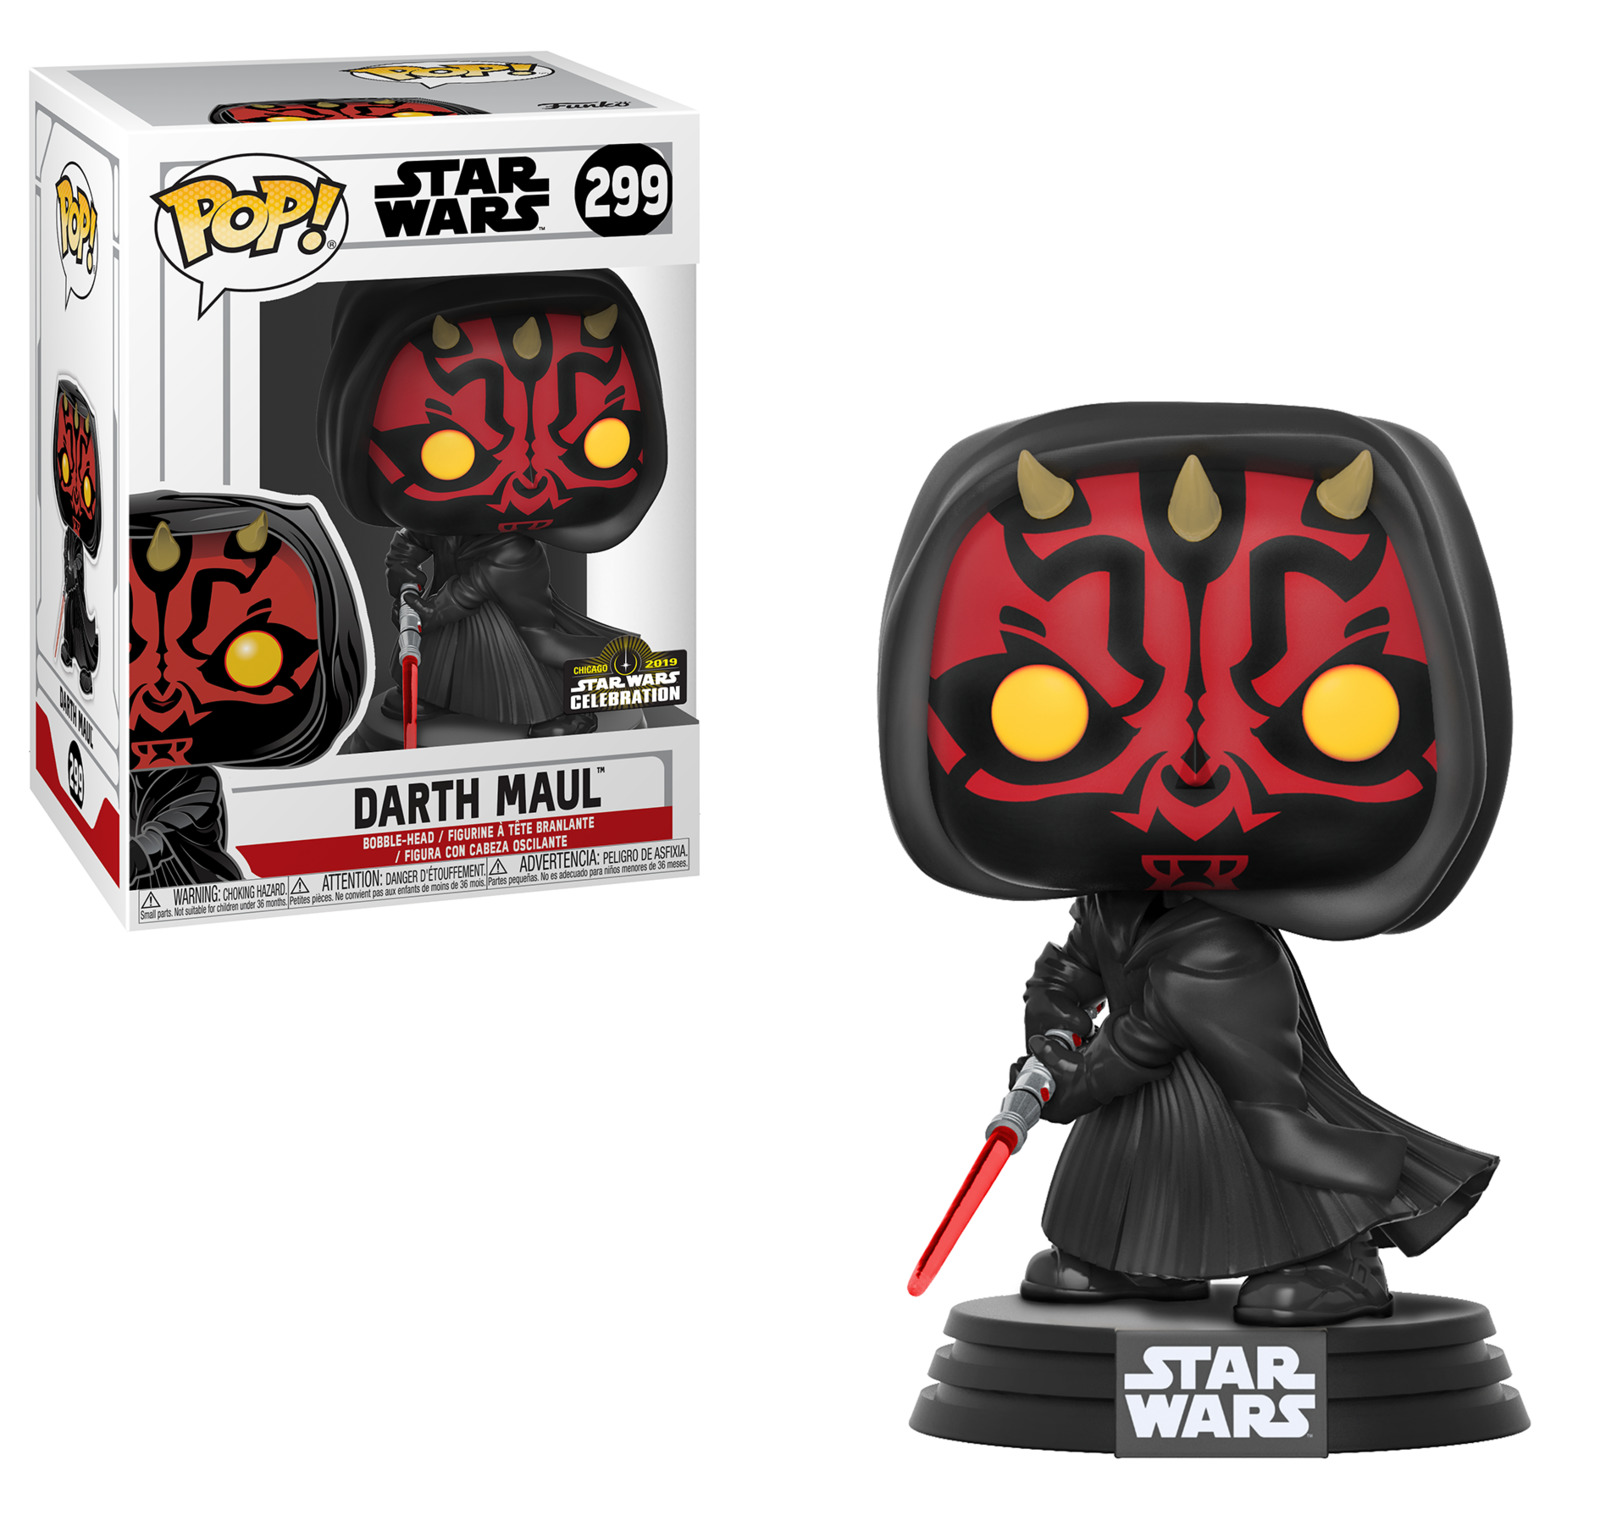 Star Wars - Darth Maul Pop! Vinyl Figure image